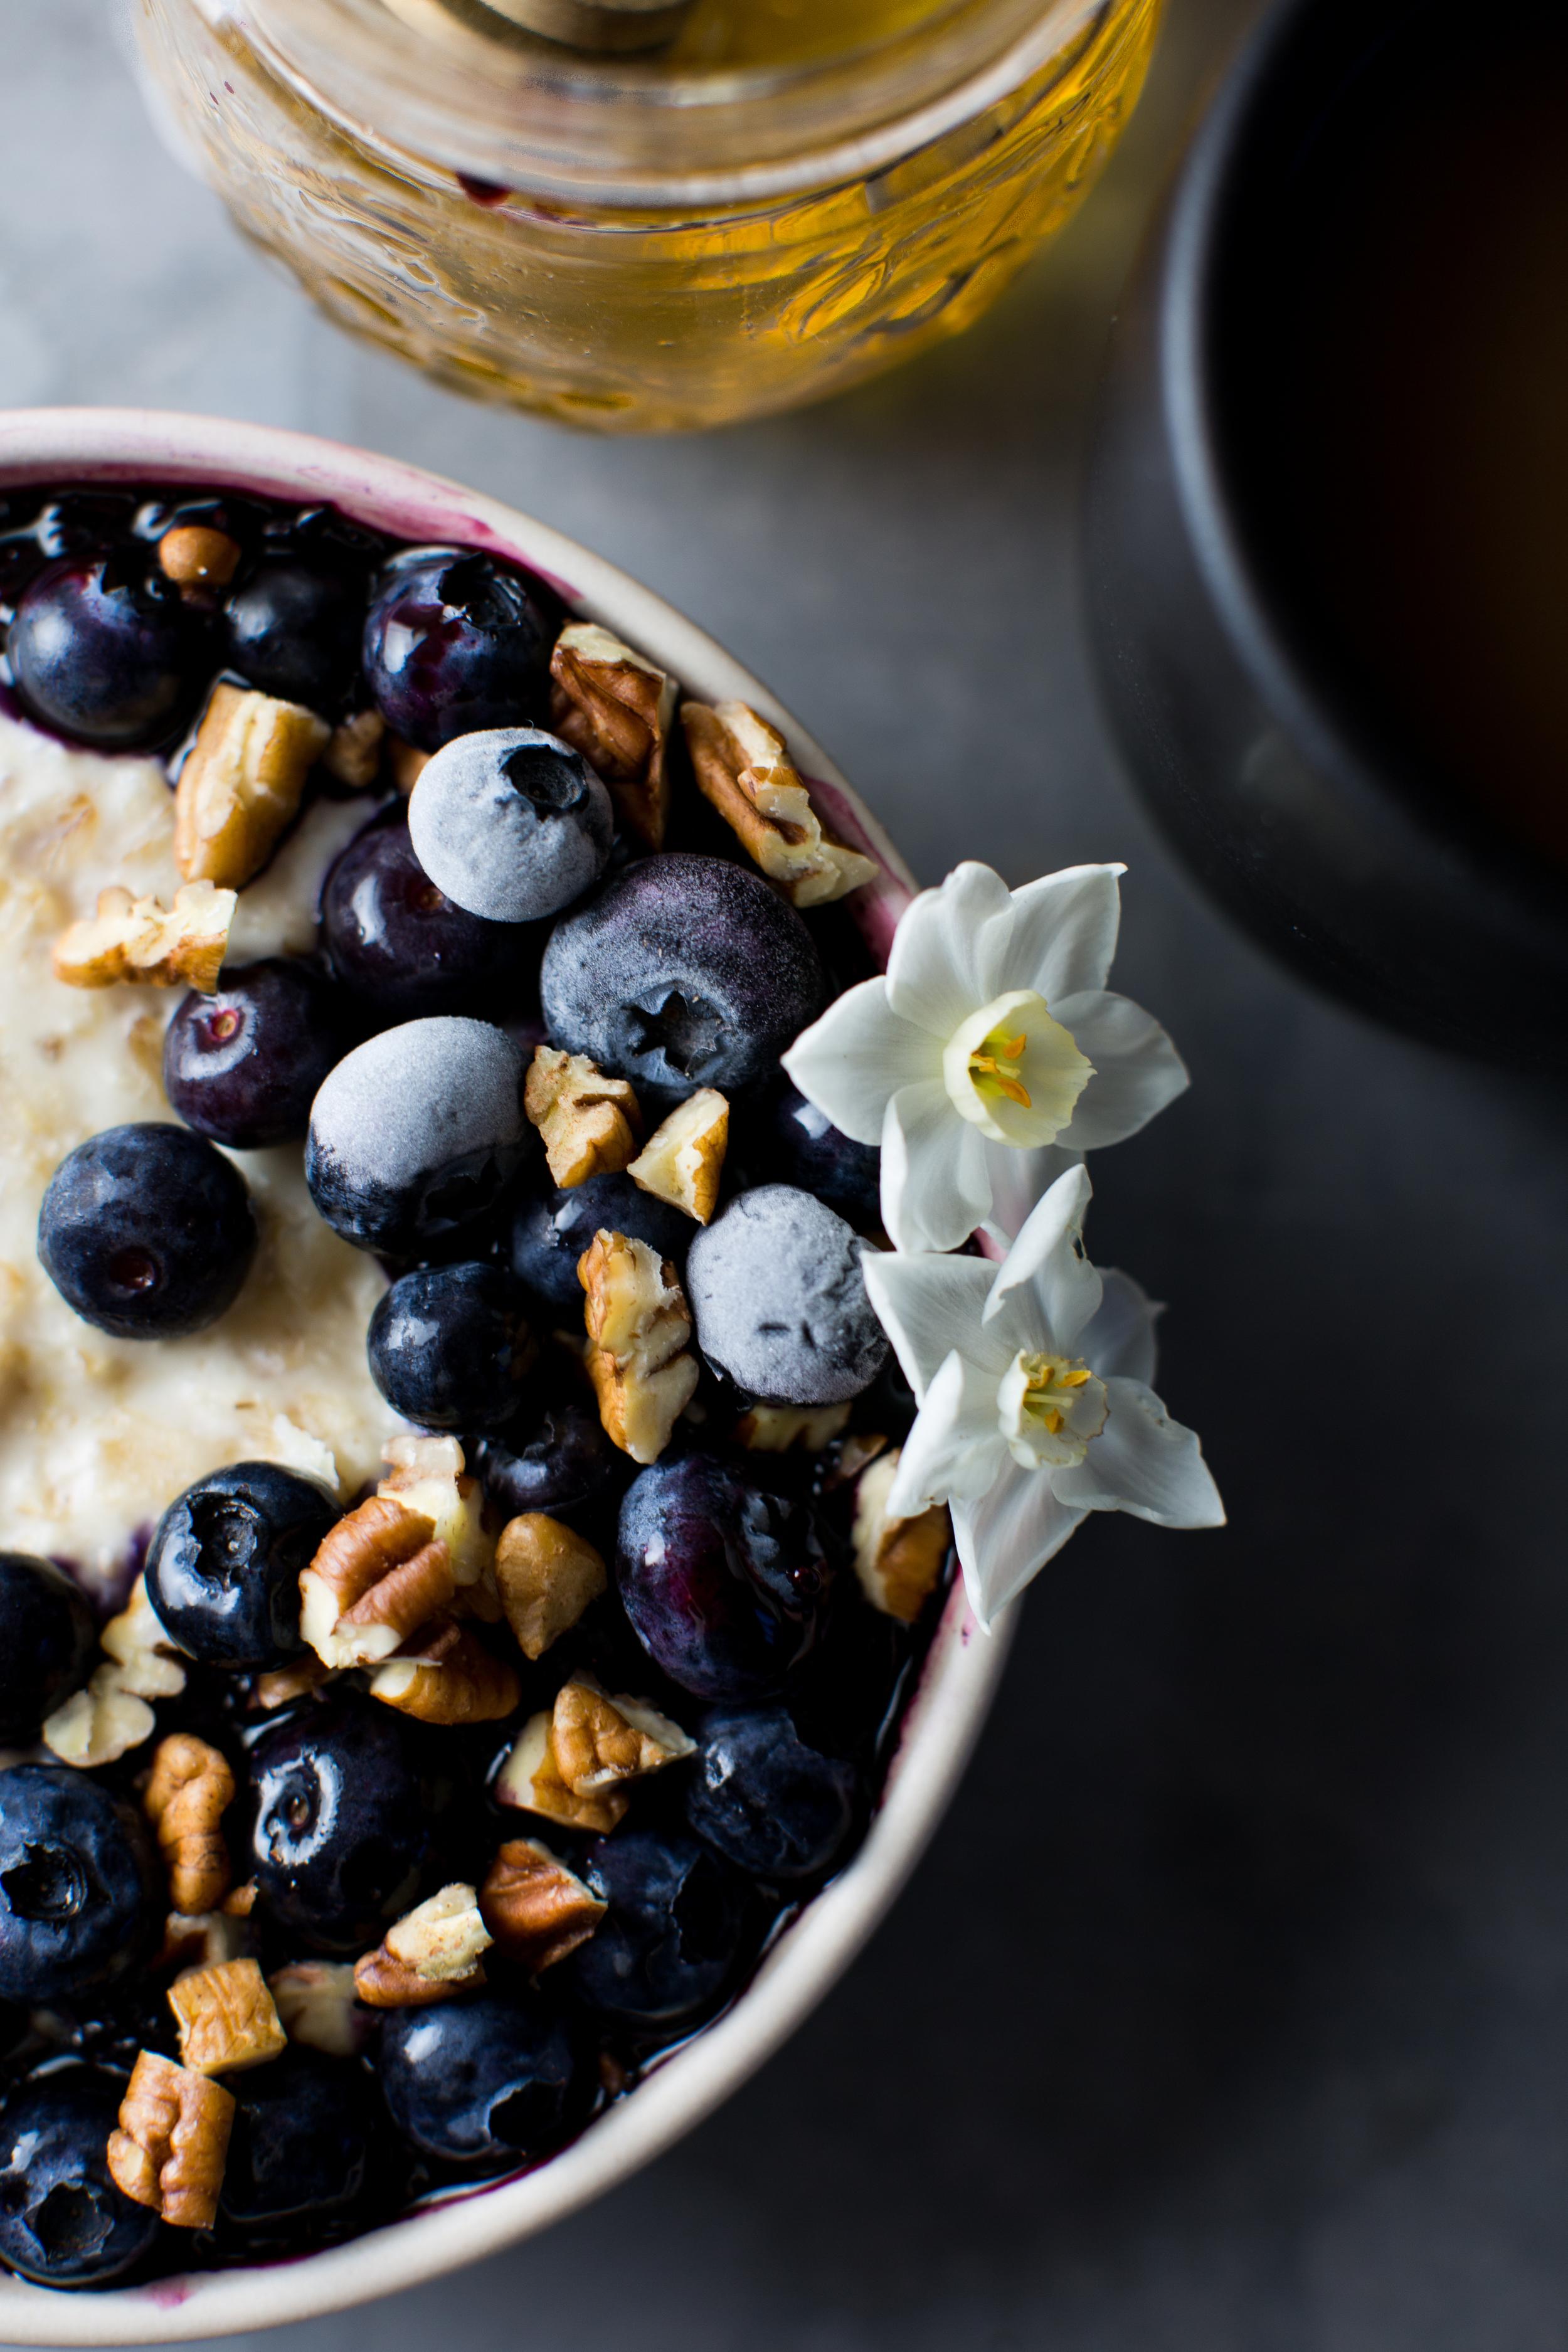 3-Macadamia-Nut-Milk-Porrisge-with-Bluberry-Lemon-Jam   www.8thandlake.com